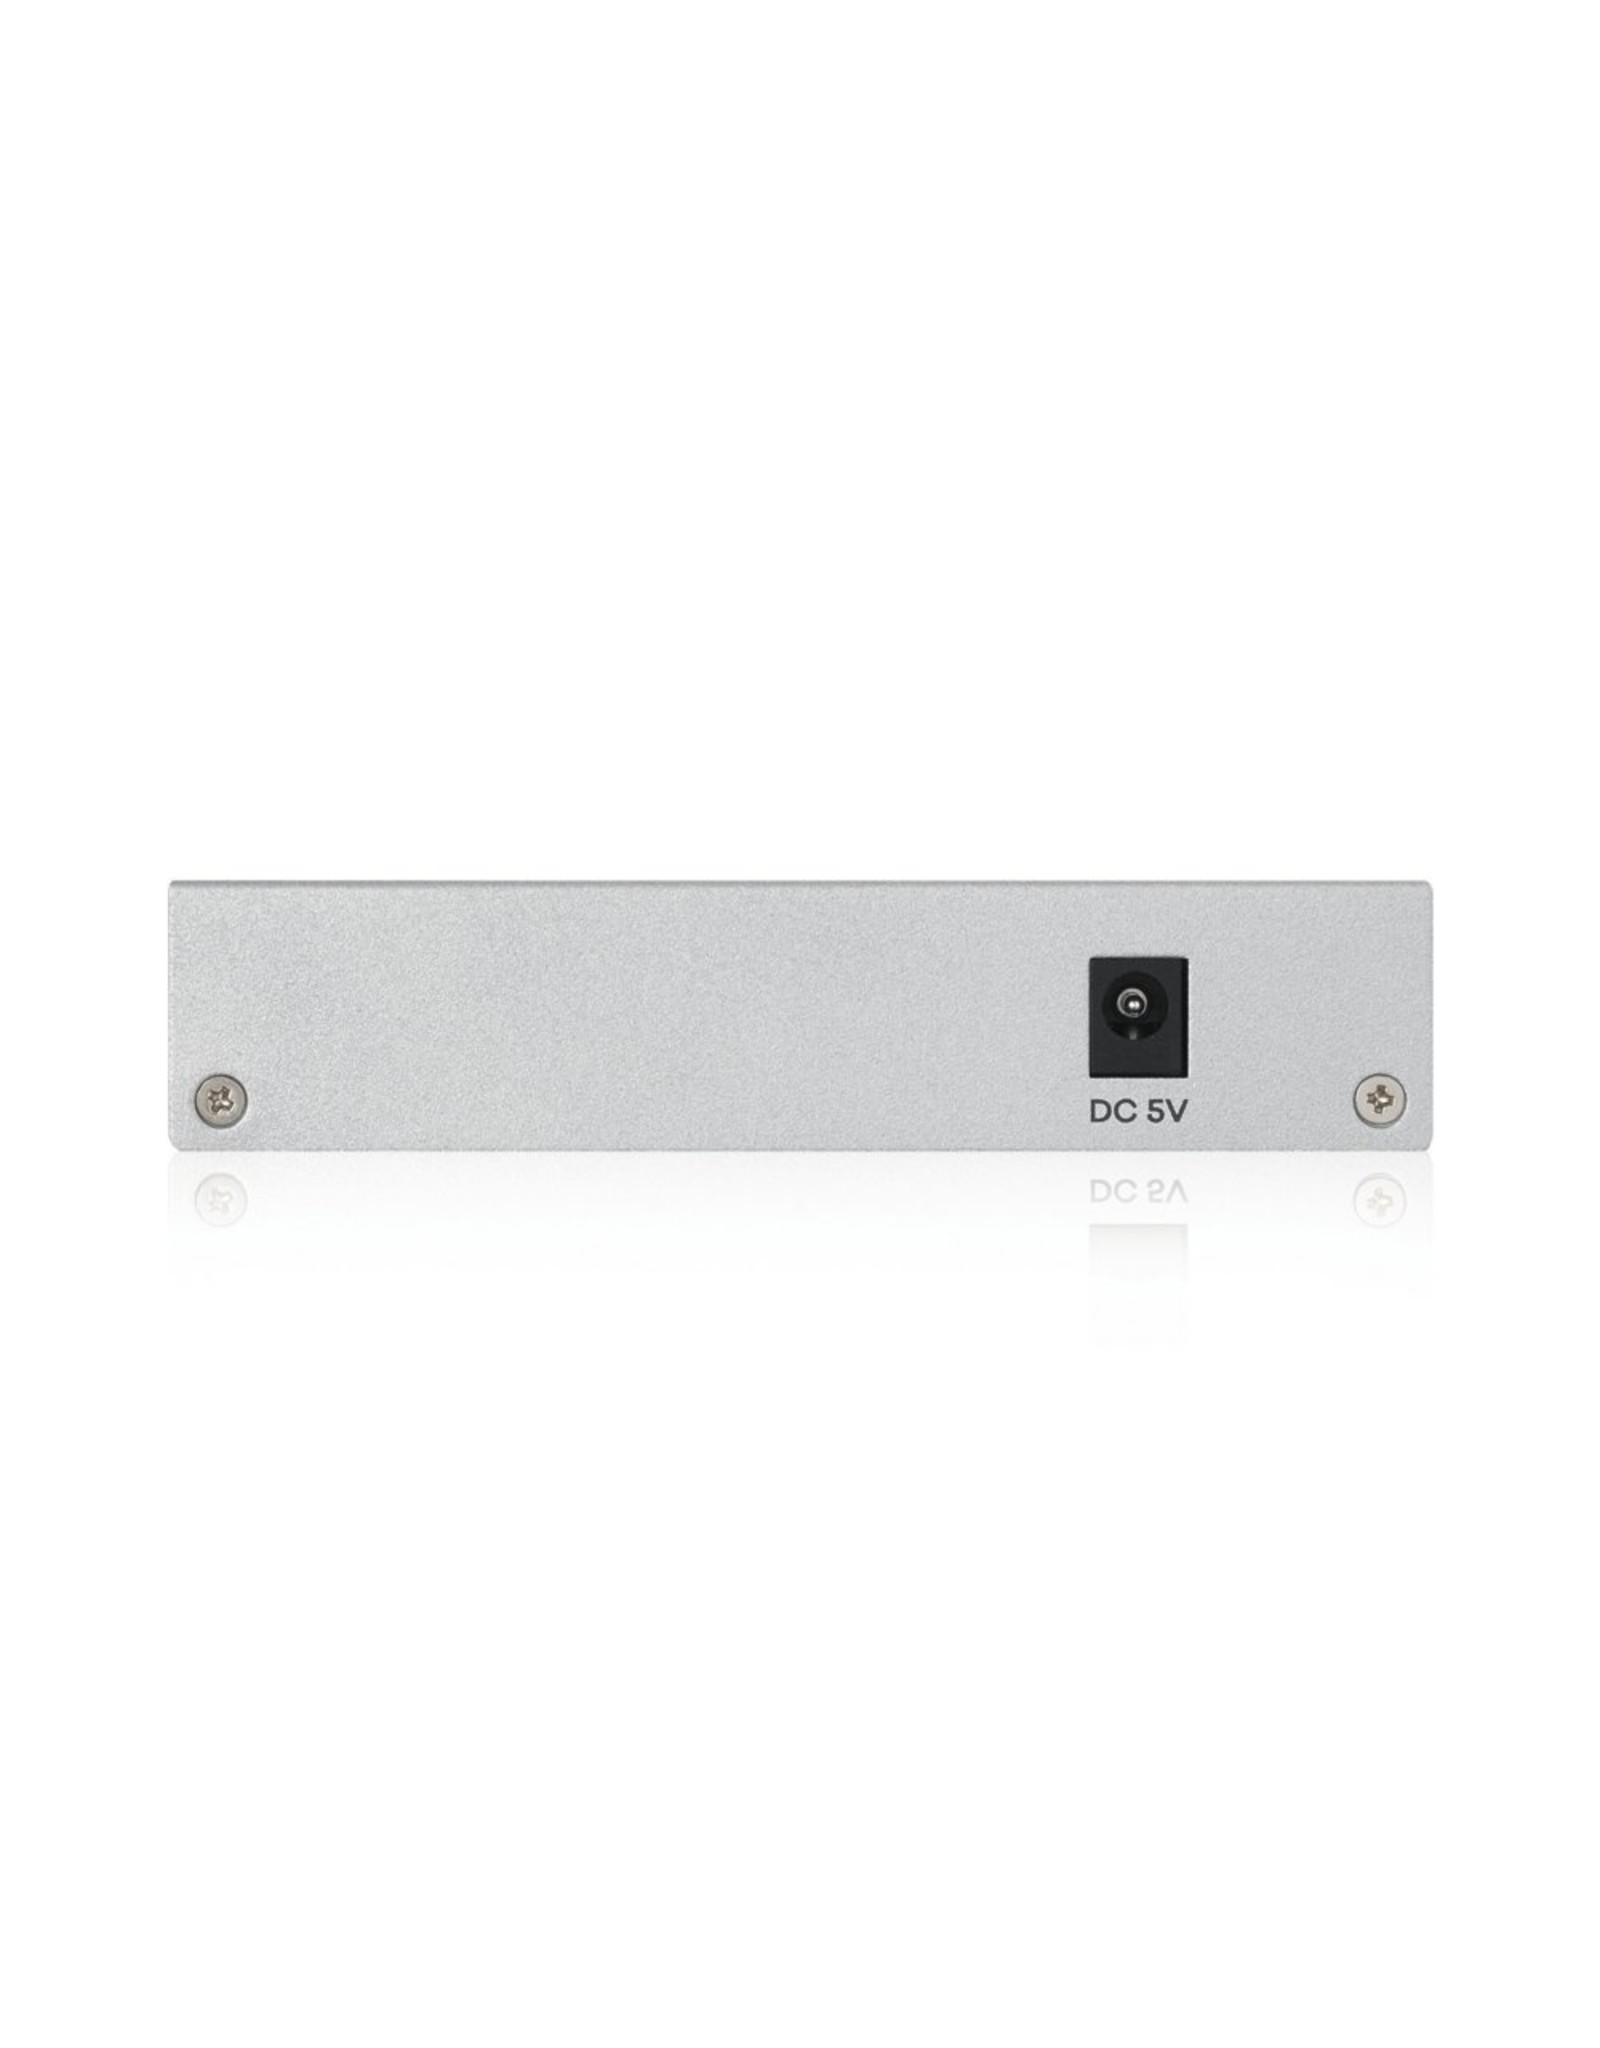 ZyXEL Zyxel GS1200-5 Managed Gigabit Ethernet Switch Zilver